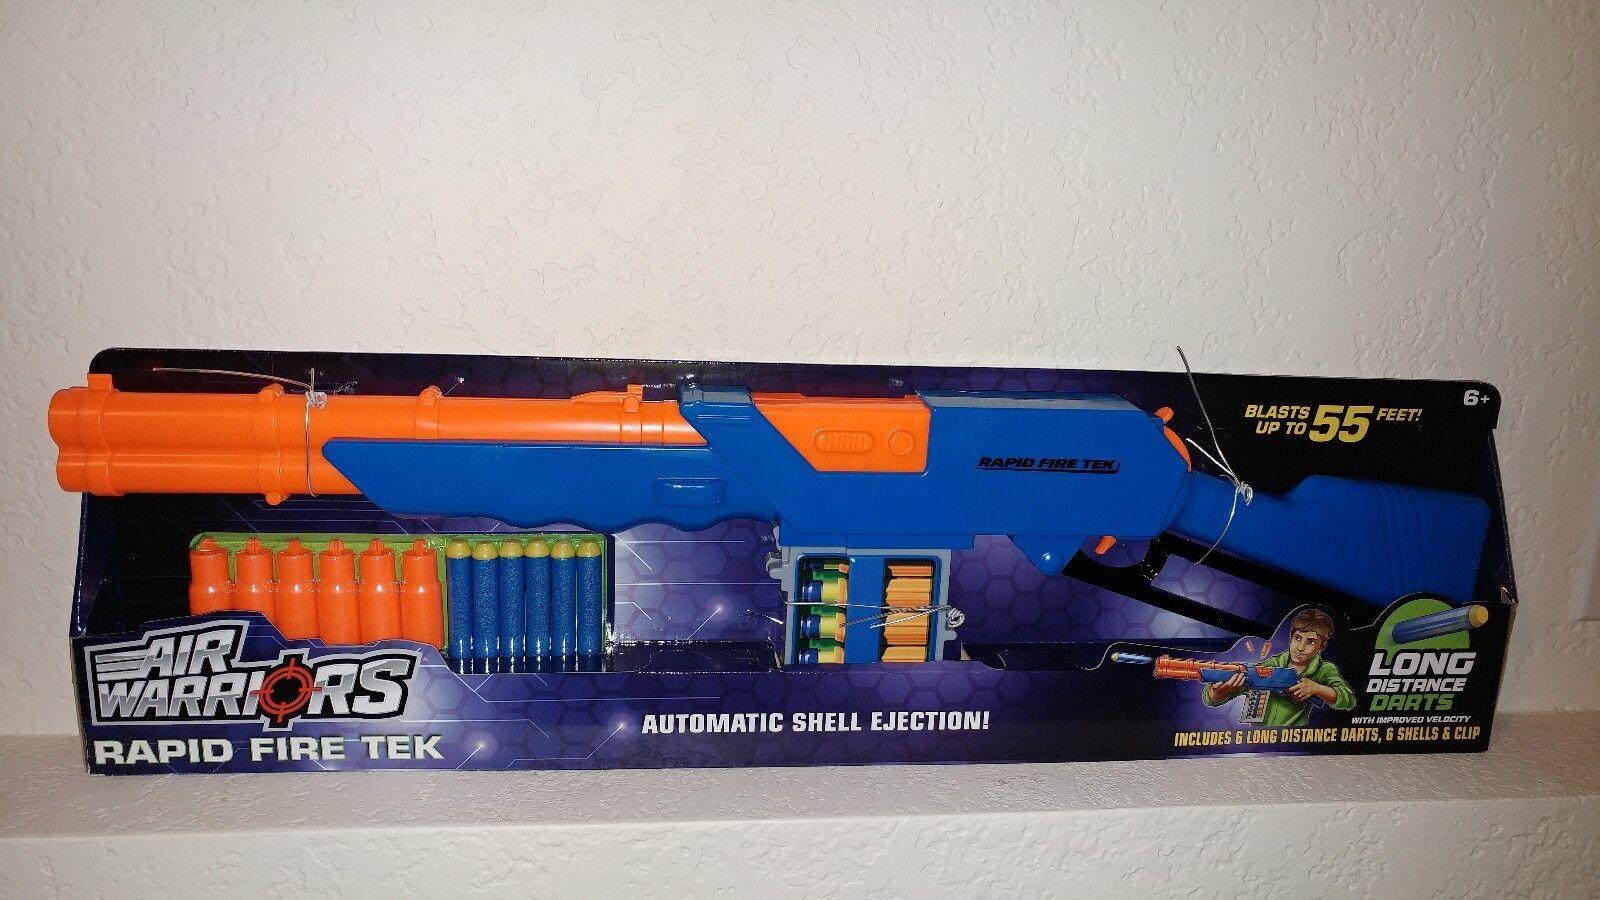 Buzz Bee Toys Toys Toys Air Warriors Blaster Rapid Fire Tek Dart Gun Rifle Lever Tech Nerf 8c5ebf